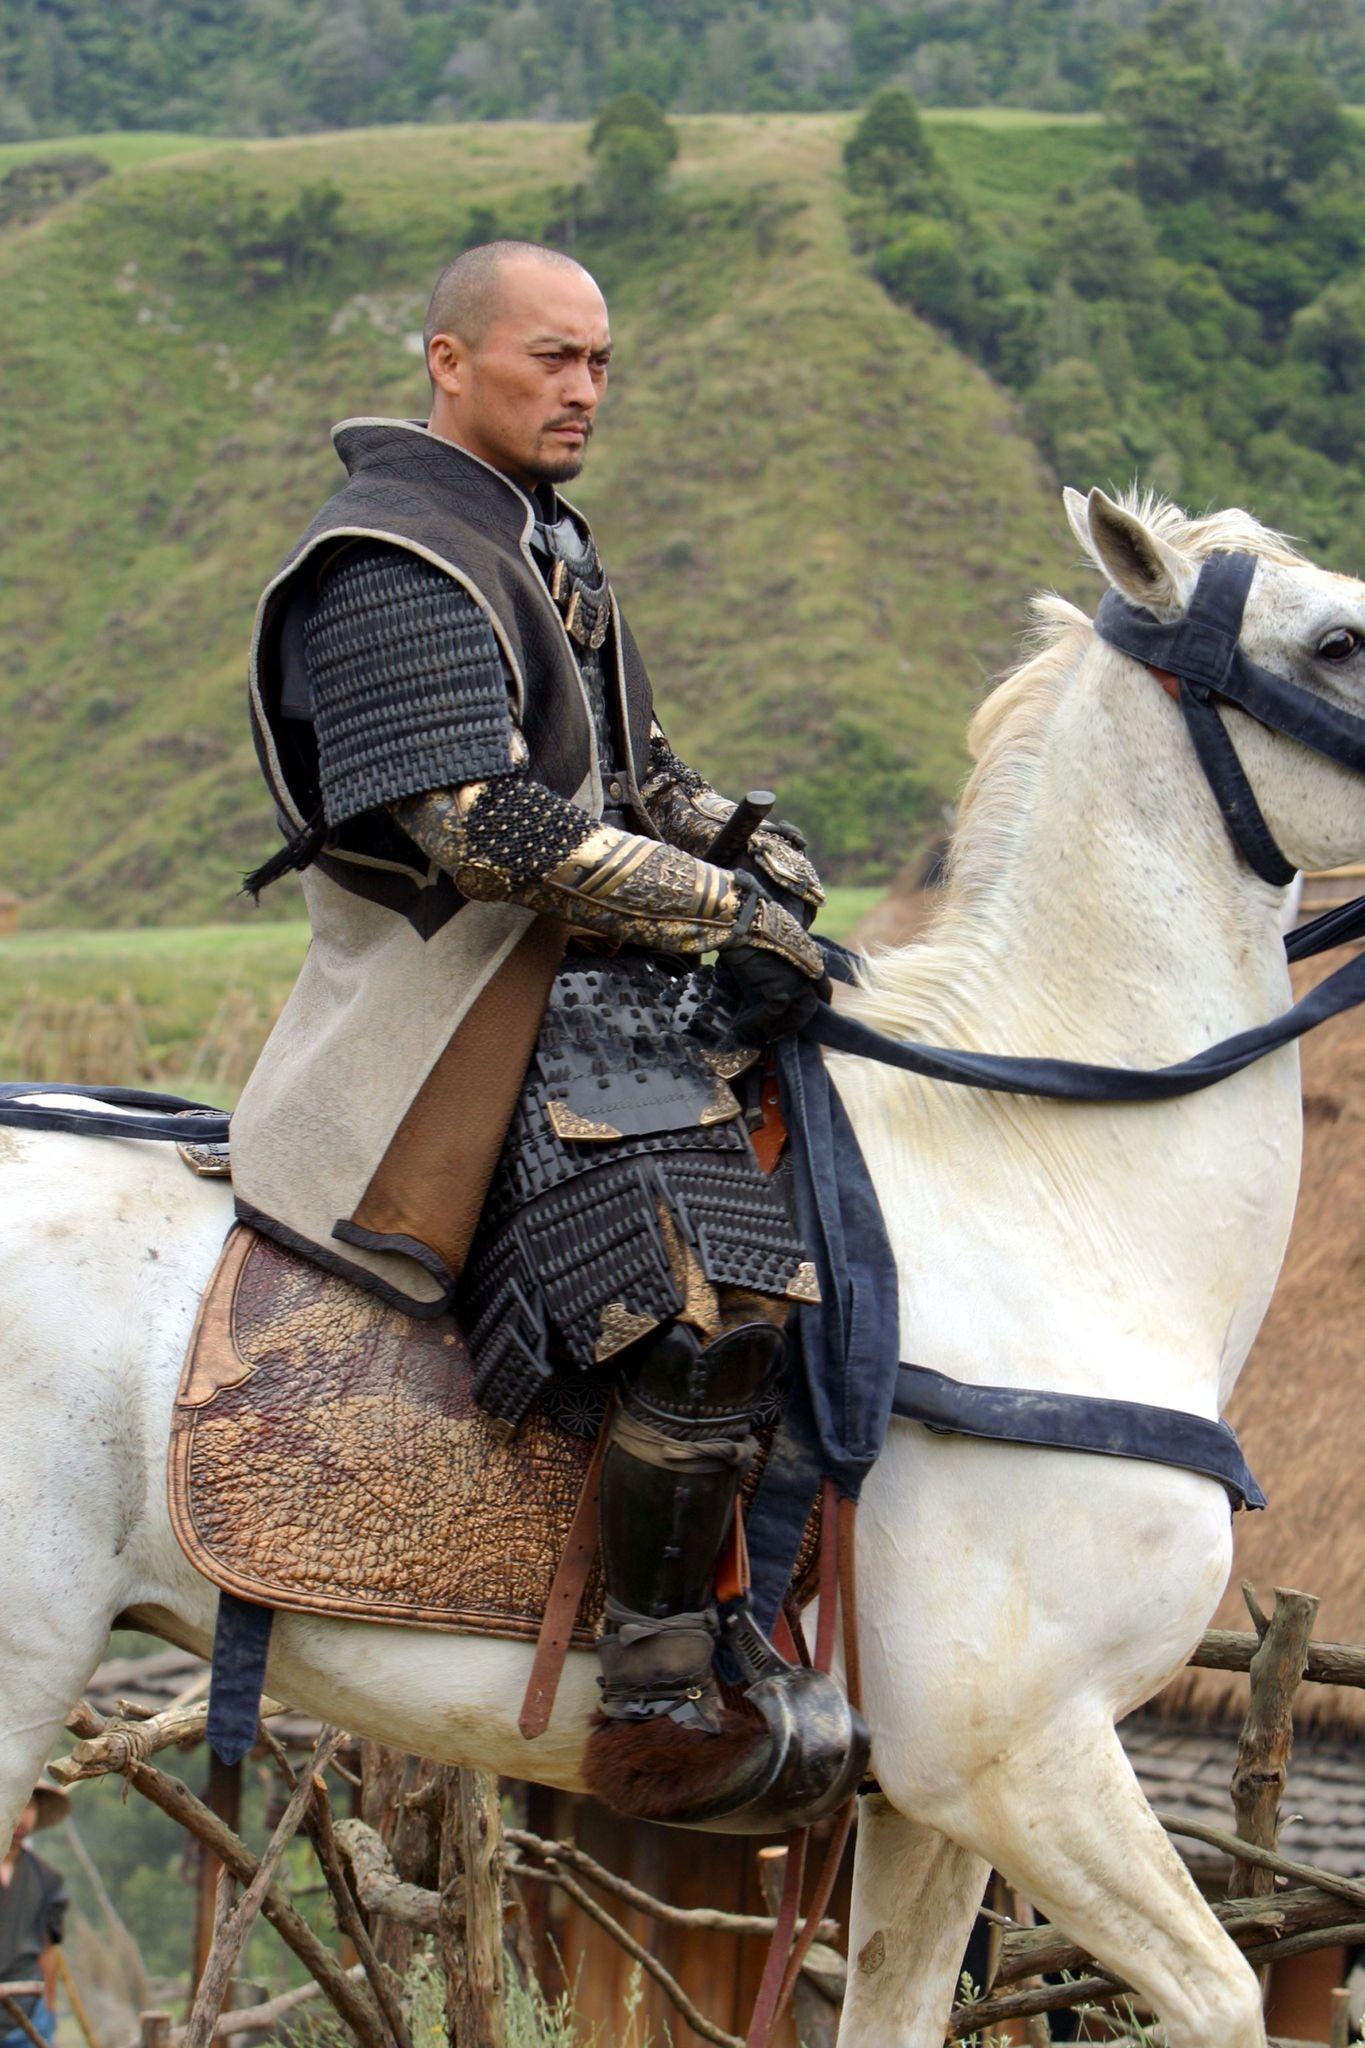 Ken Watanabe in The Last Samurai (2003)